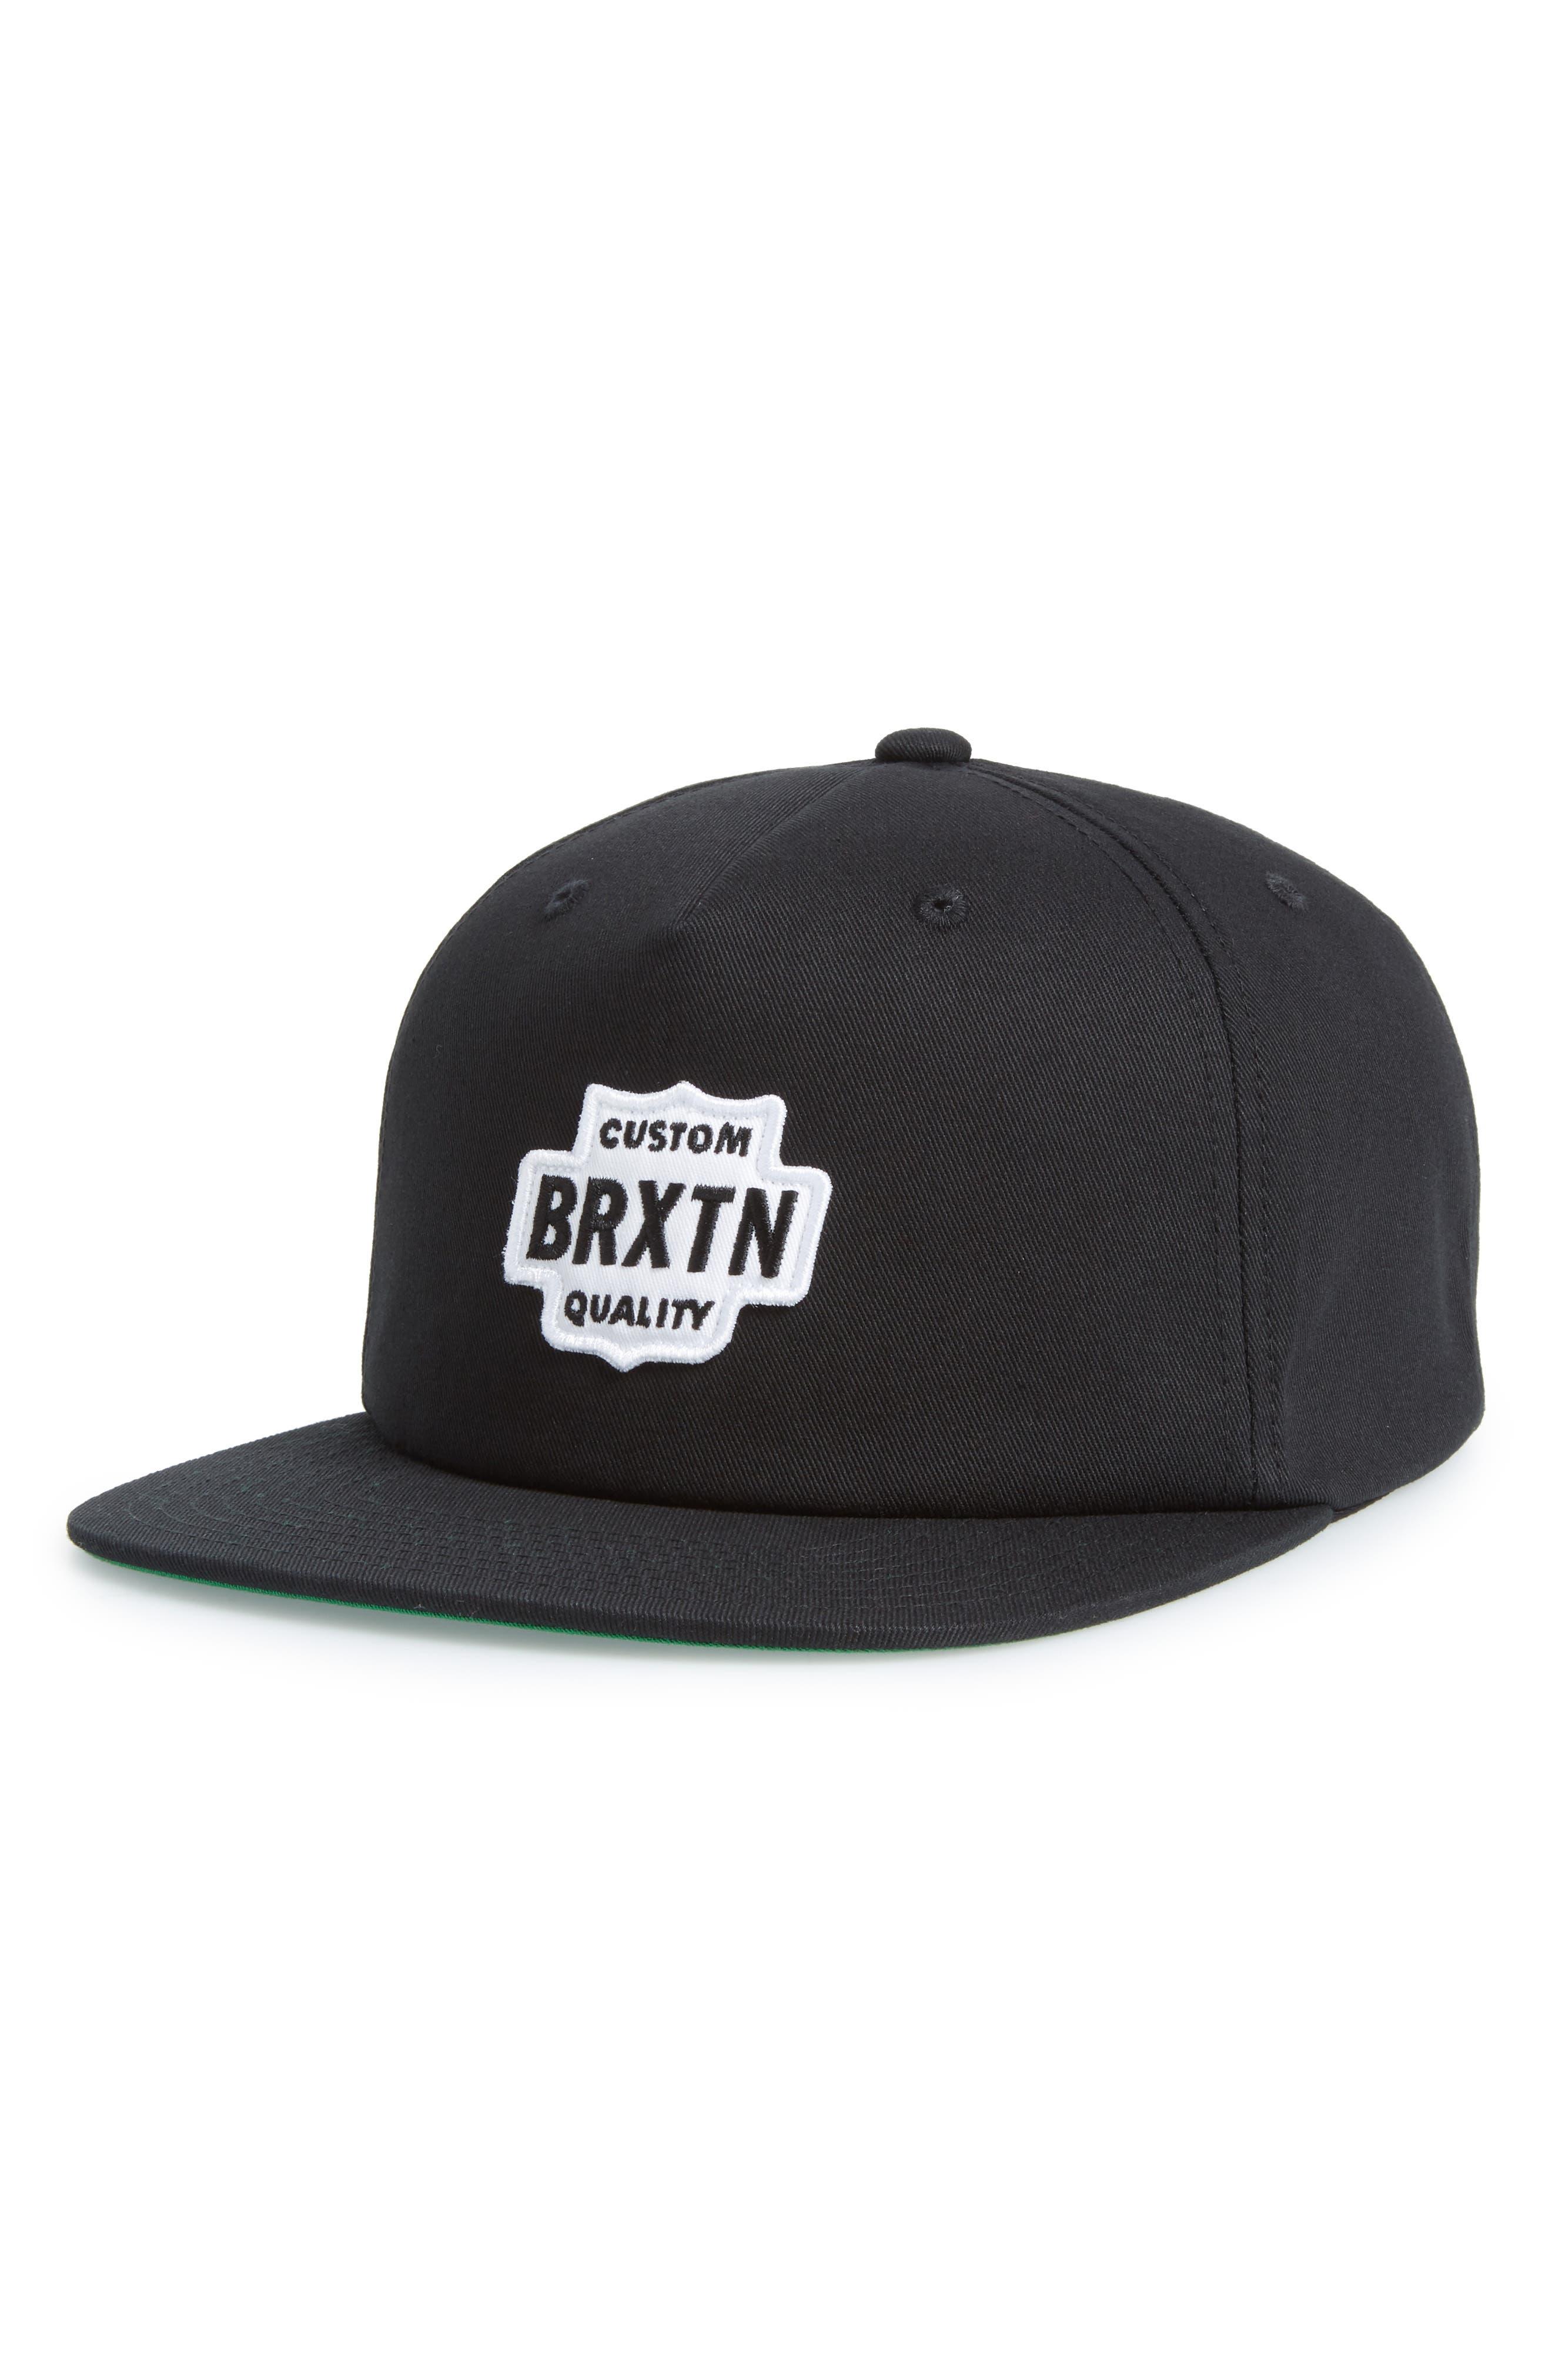 Garth Flat Brimmed Cap,                         Main,                         color, BLACK/ WHITE